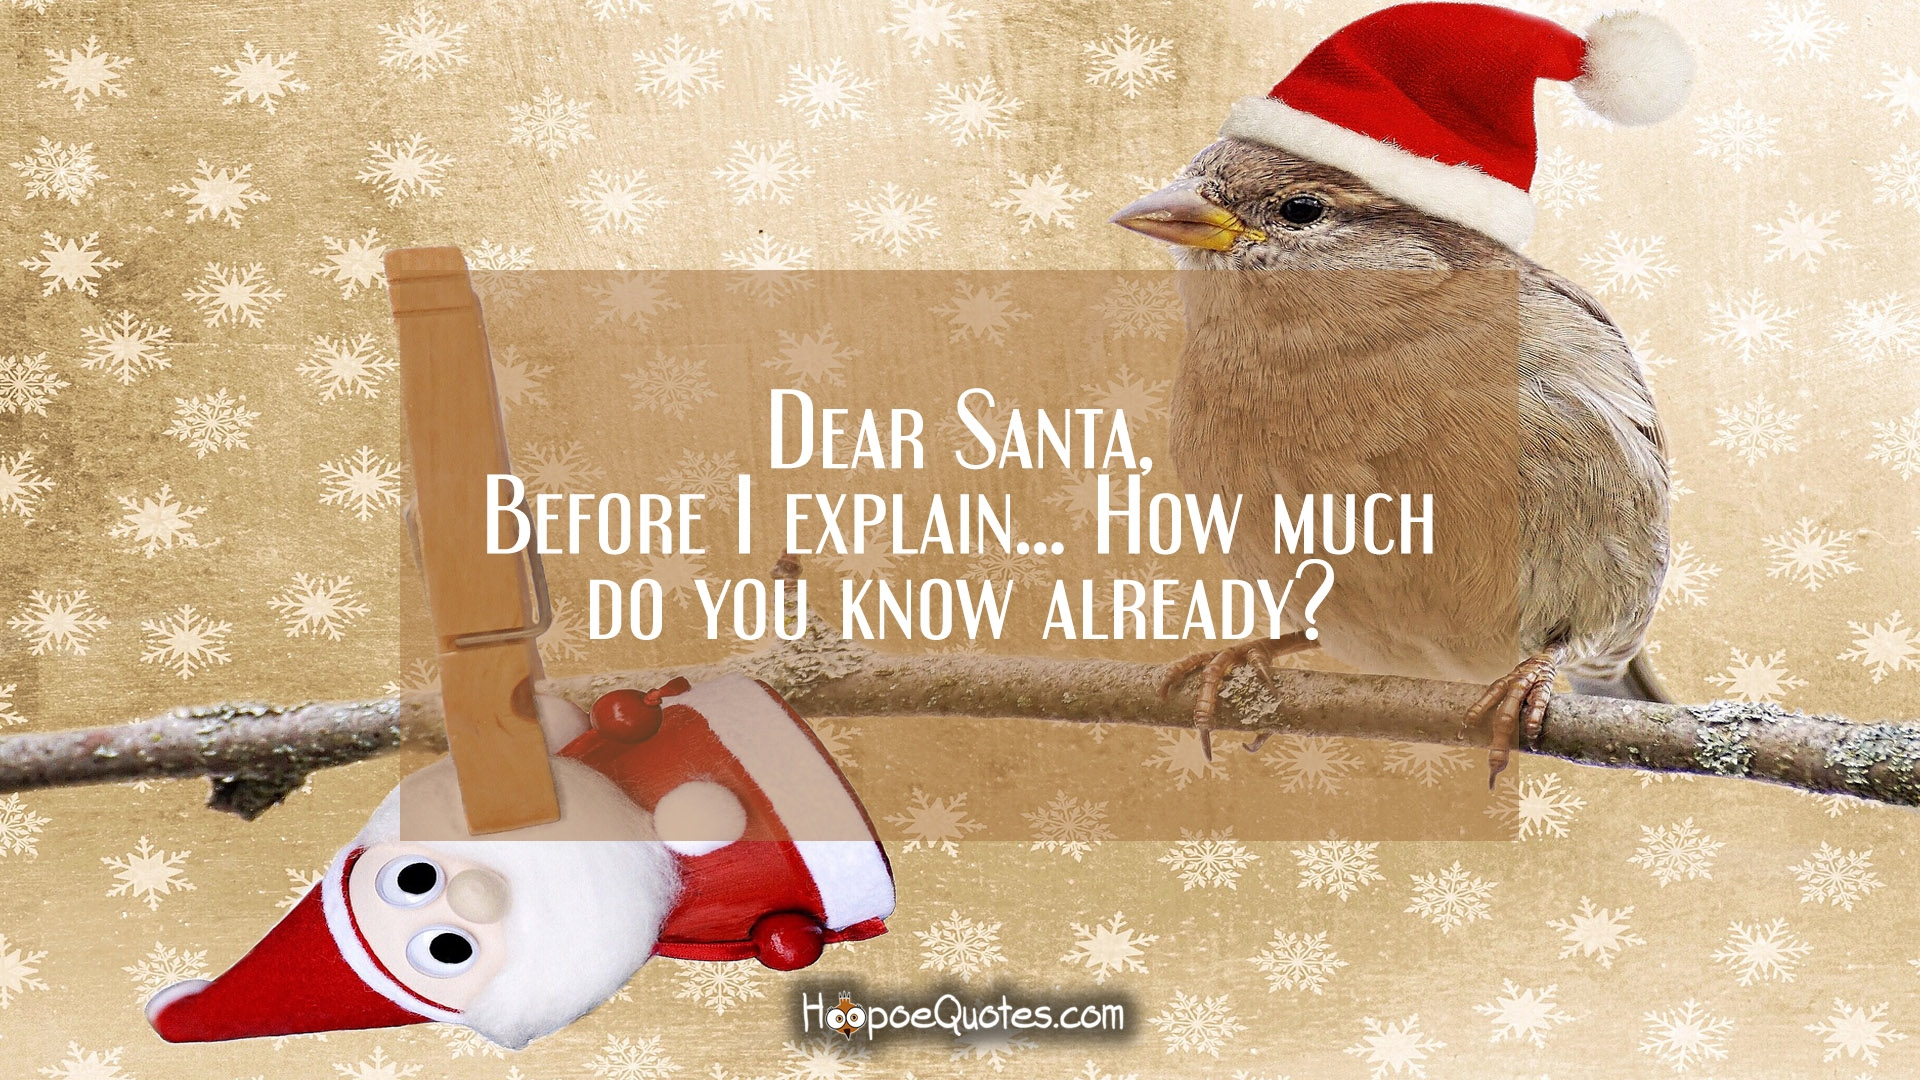 Dear Santa Before I Explain How Much Do You Know